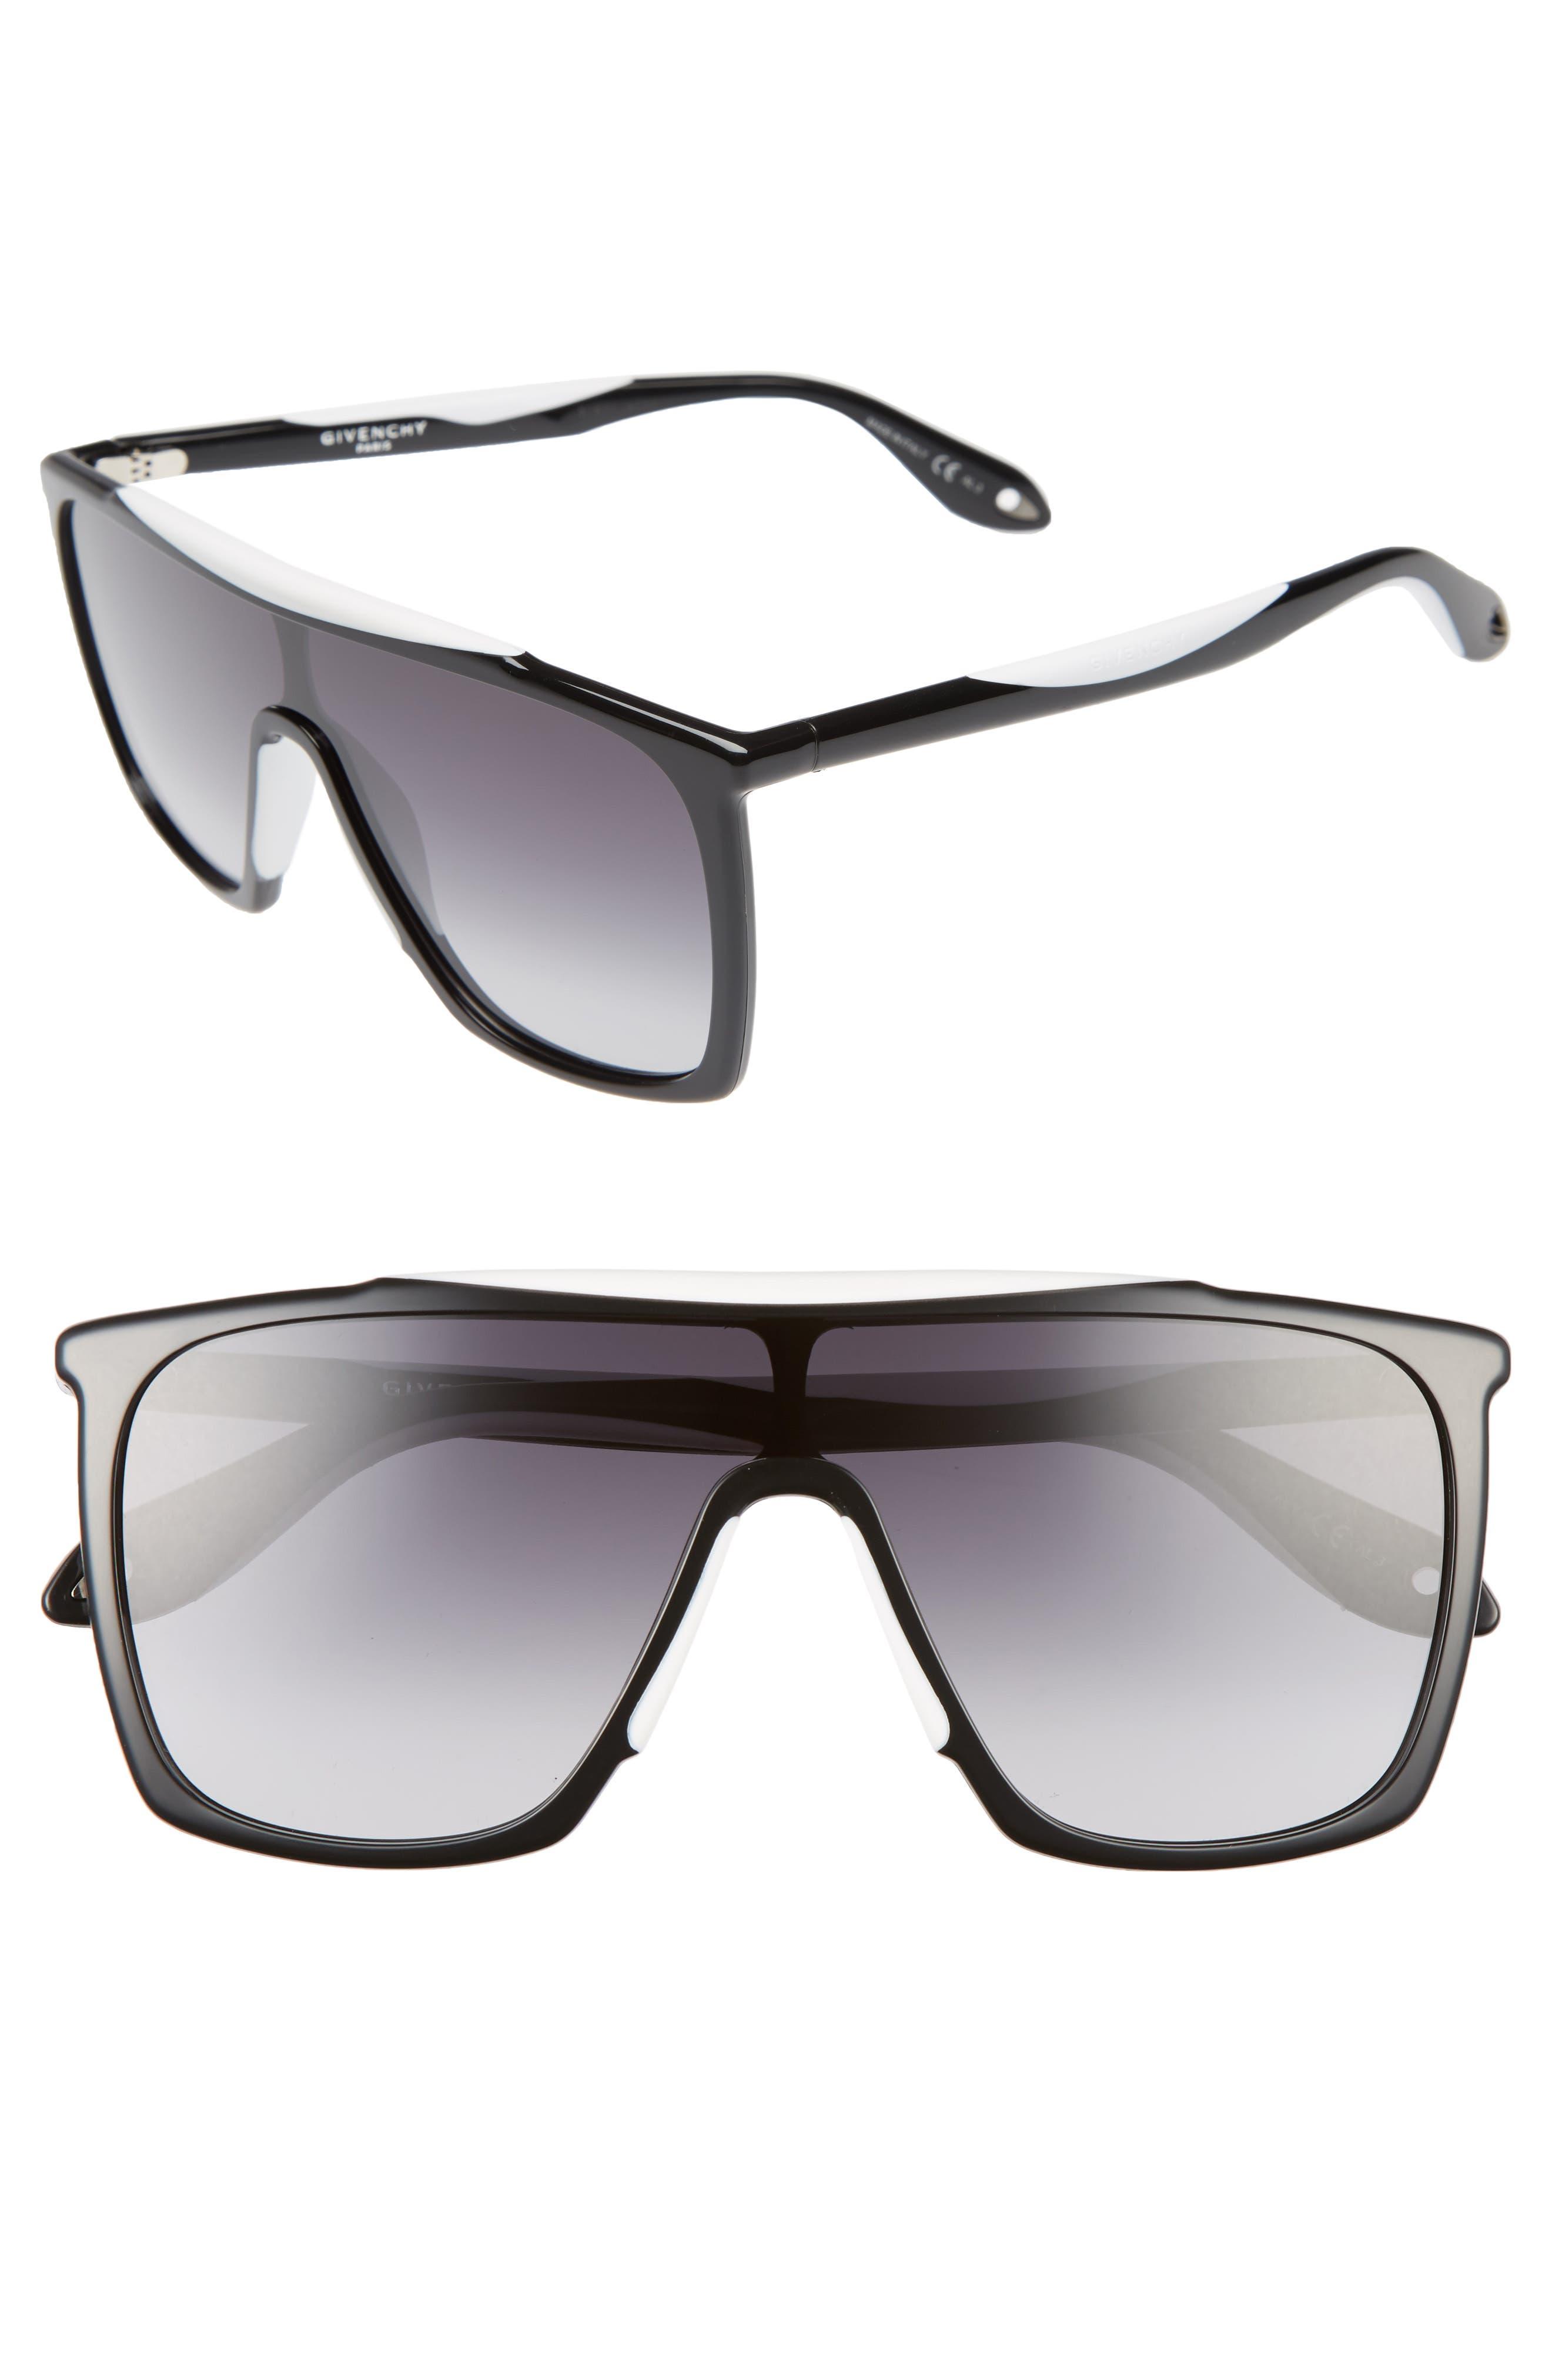 53mm Mask Sunglasses,                         Main,                         color,